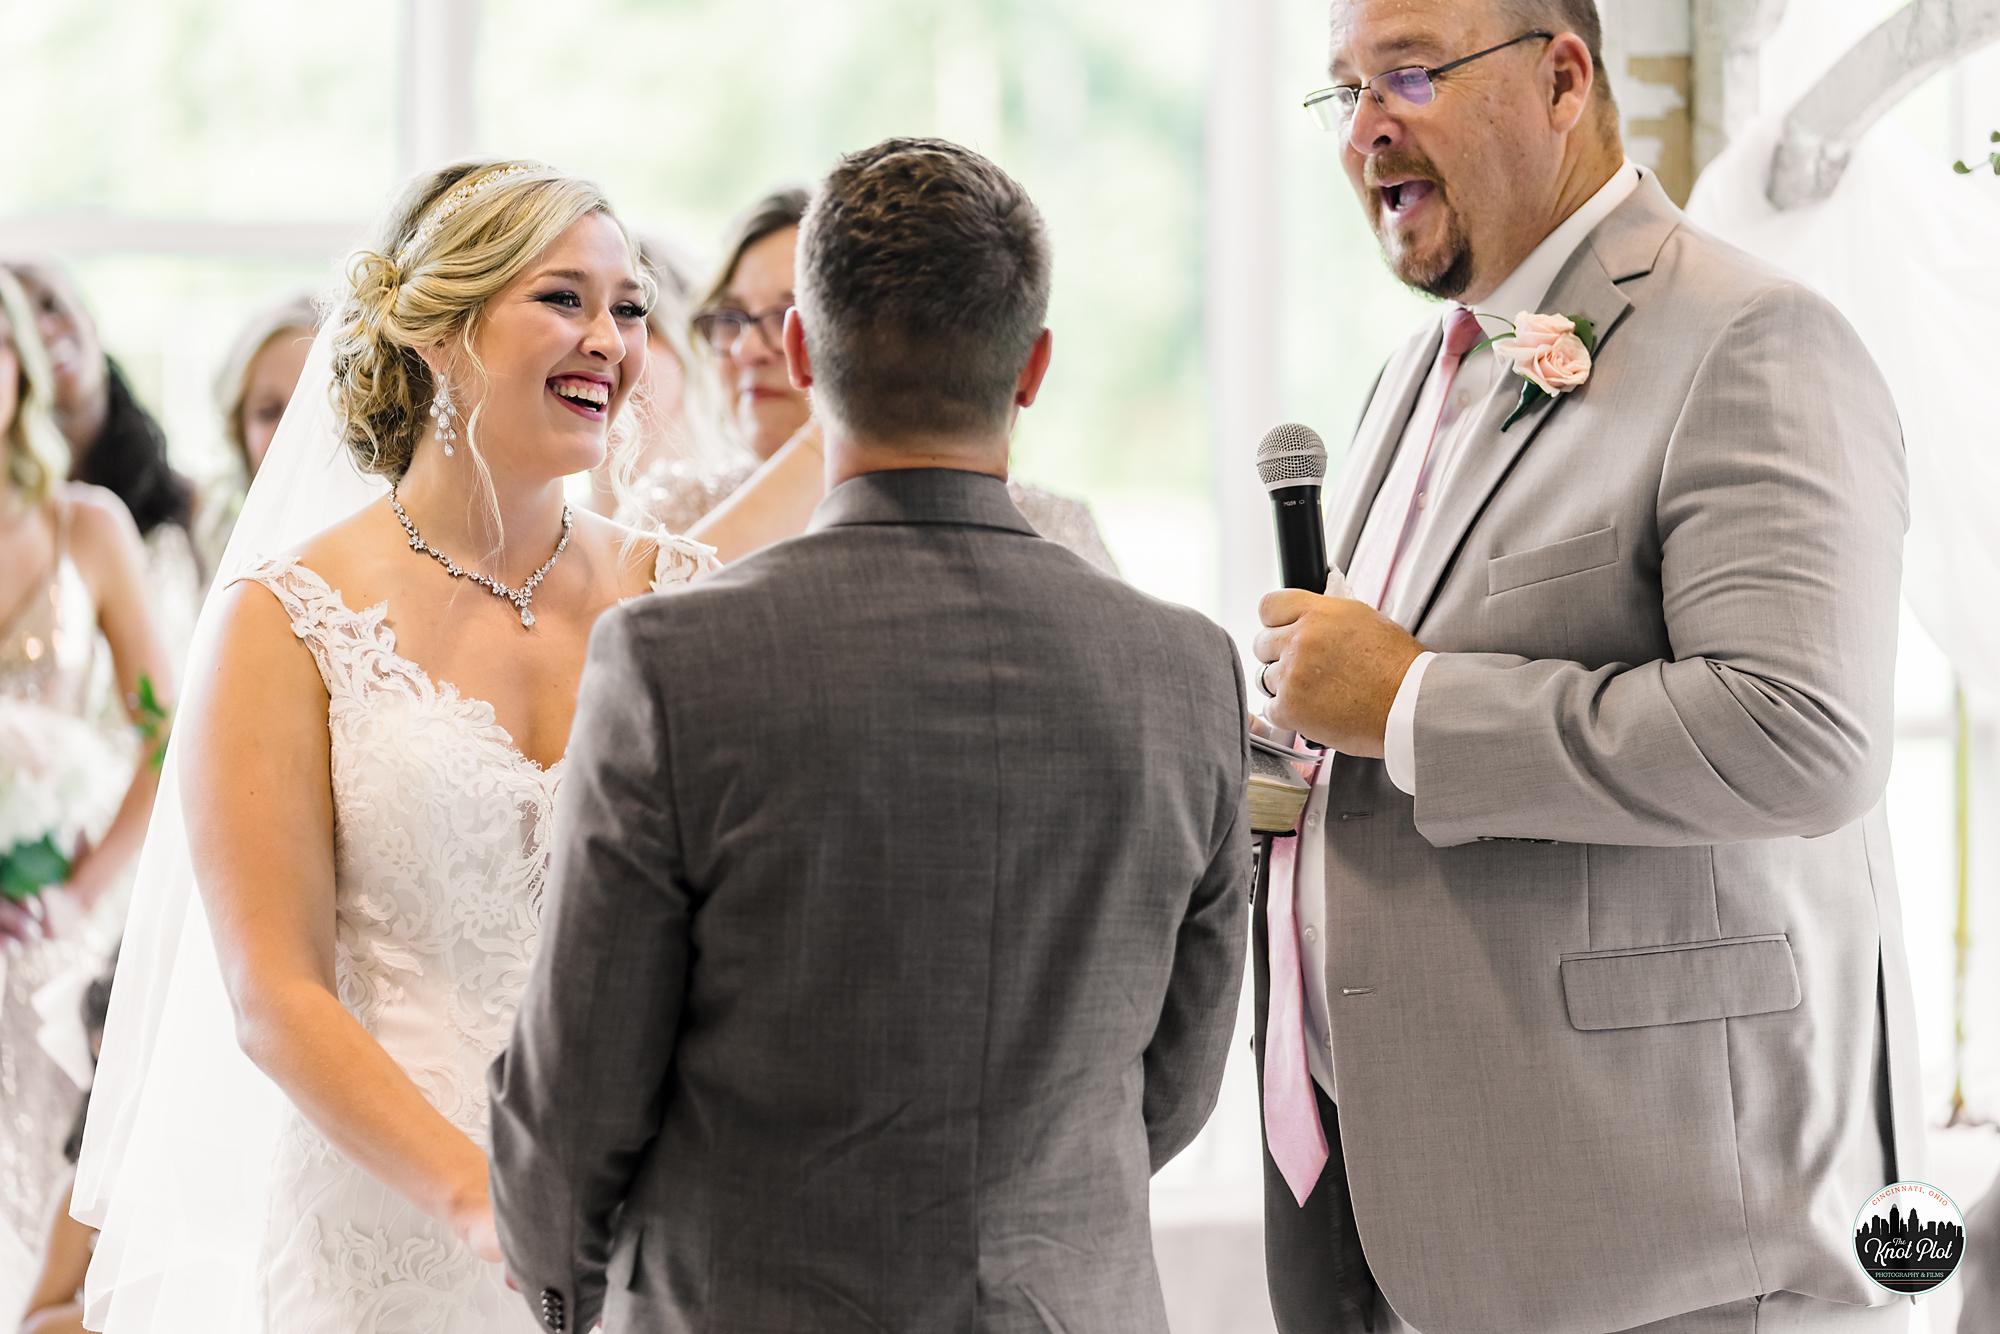 Southgate-Community-Center-KY-Wedding-Photography-13.jpg